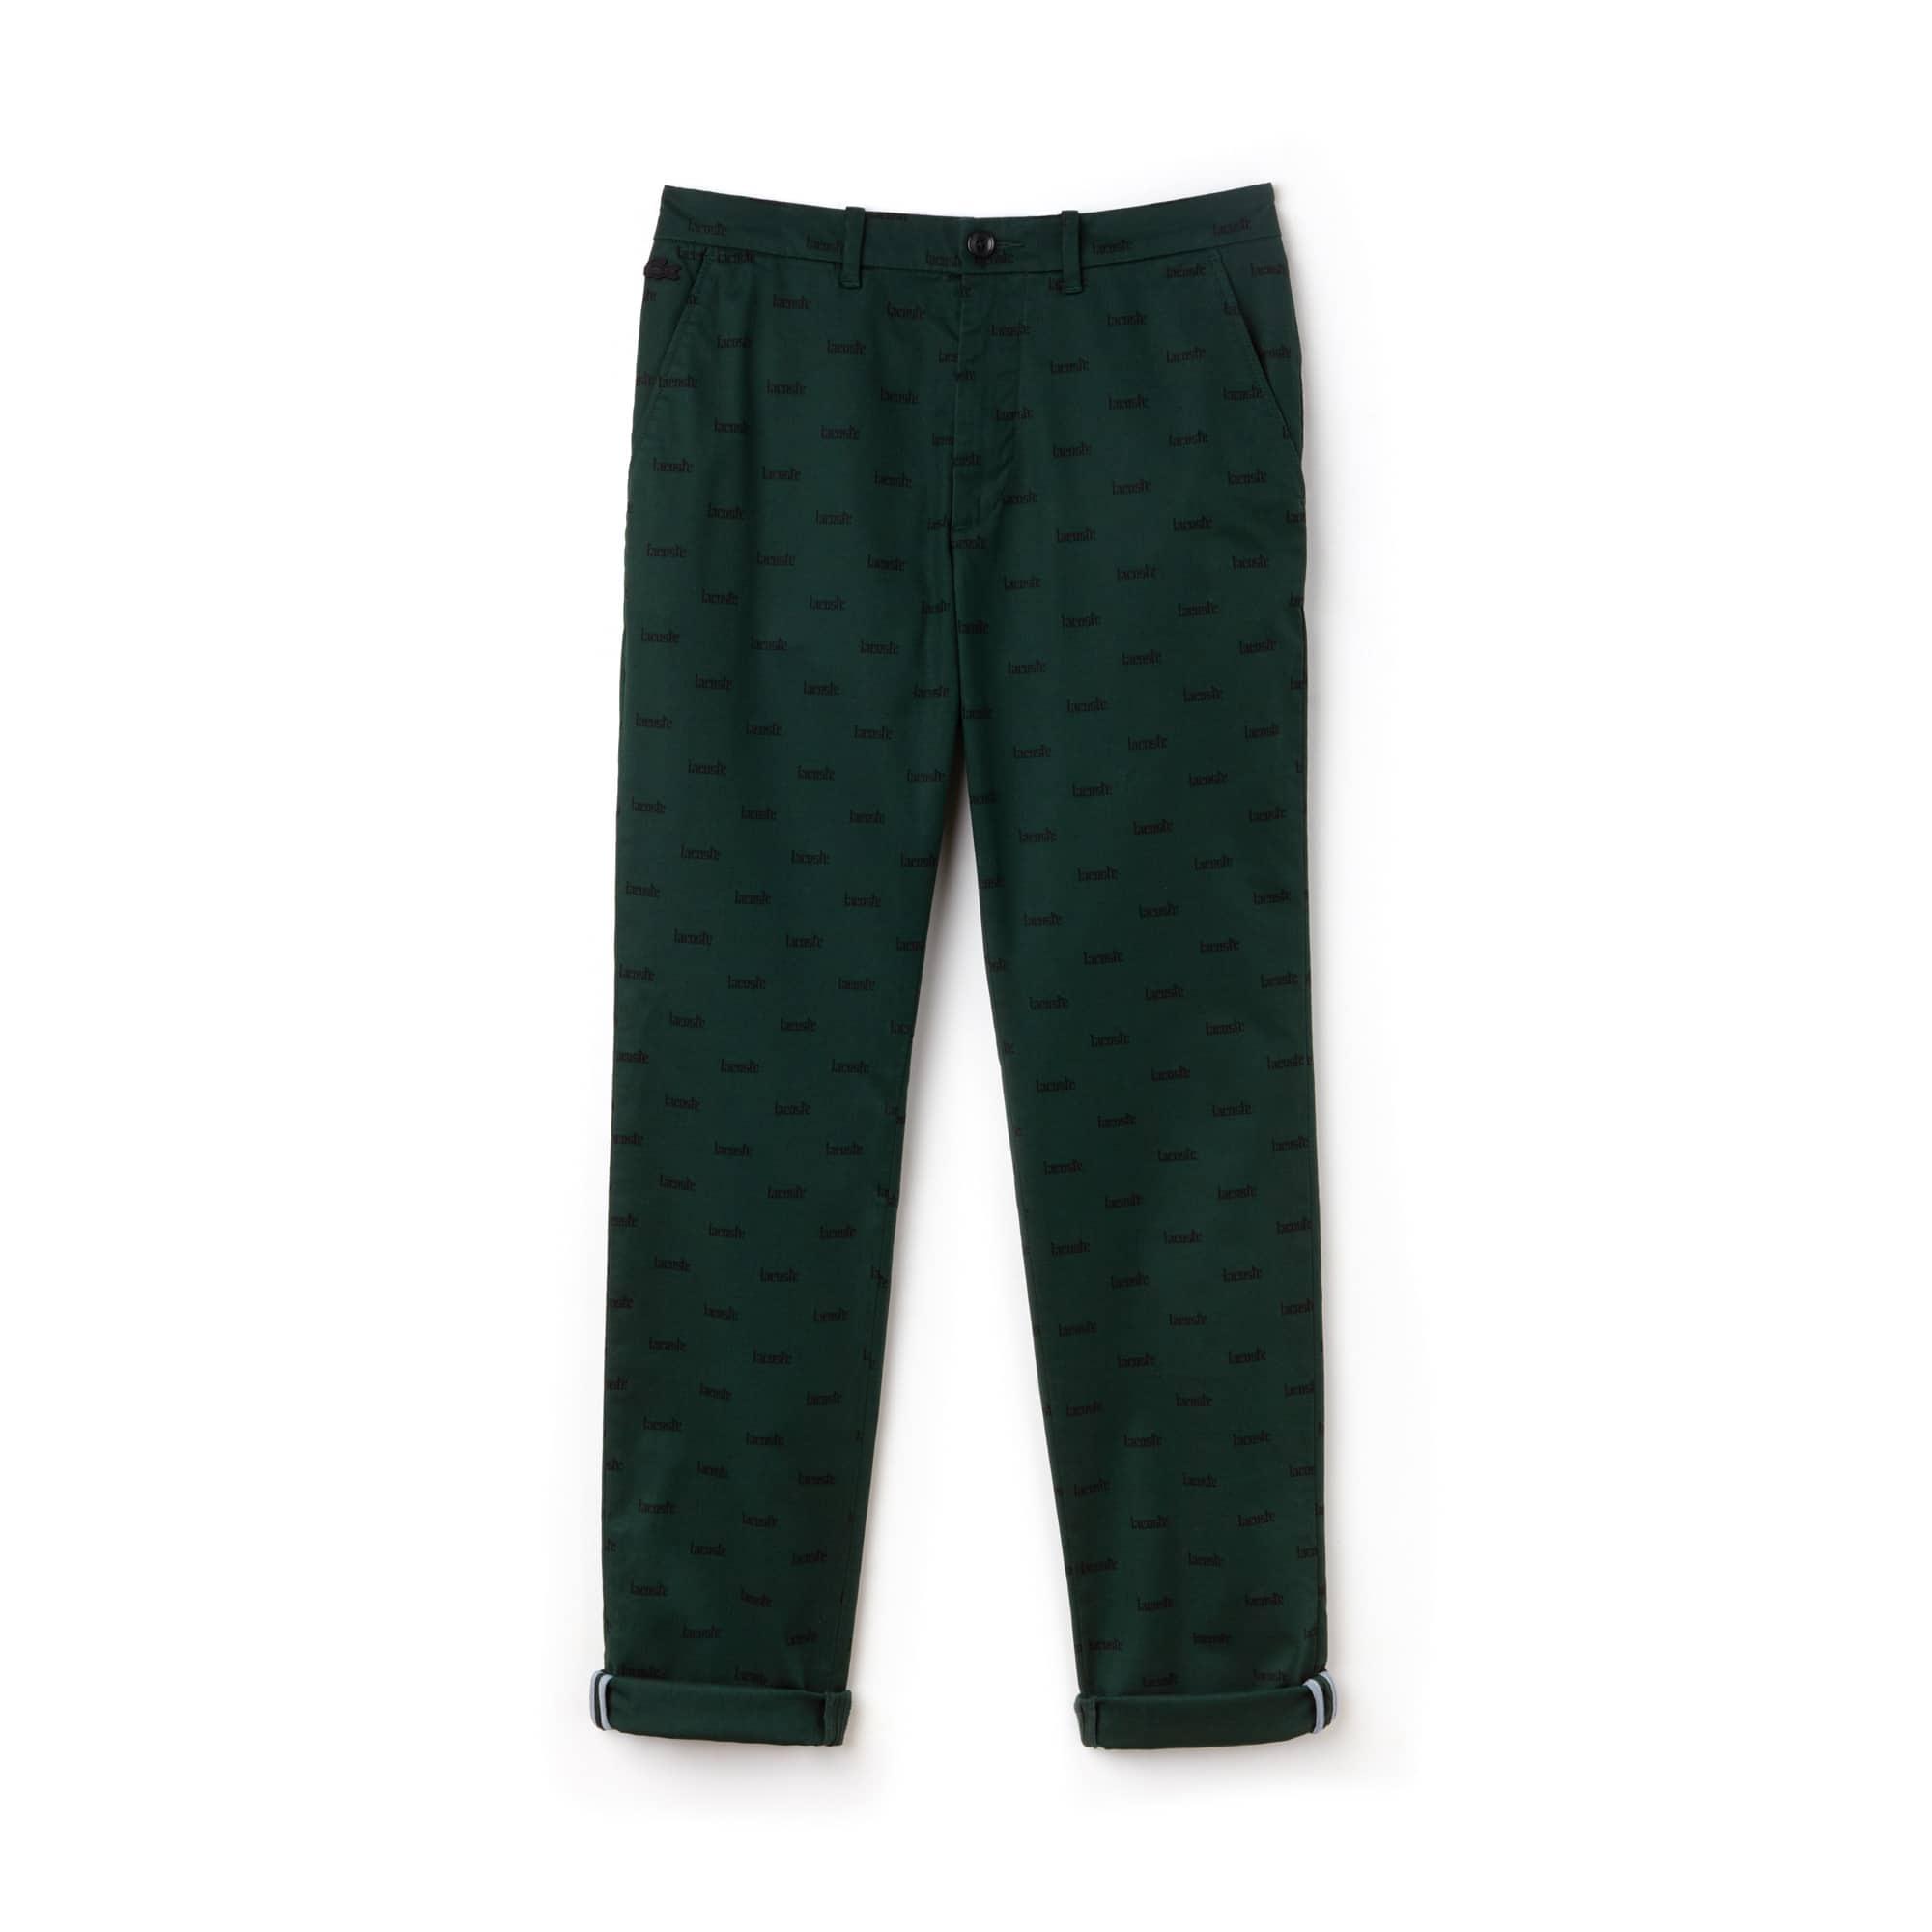 Men's LIVE Print Stretch Cotton Twill Chino Pants